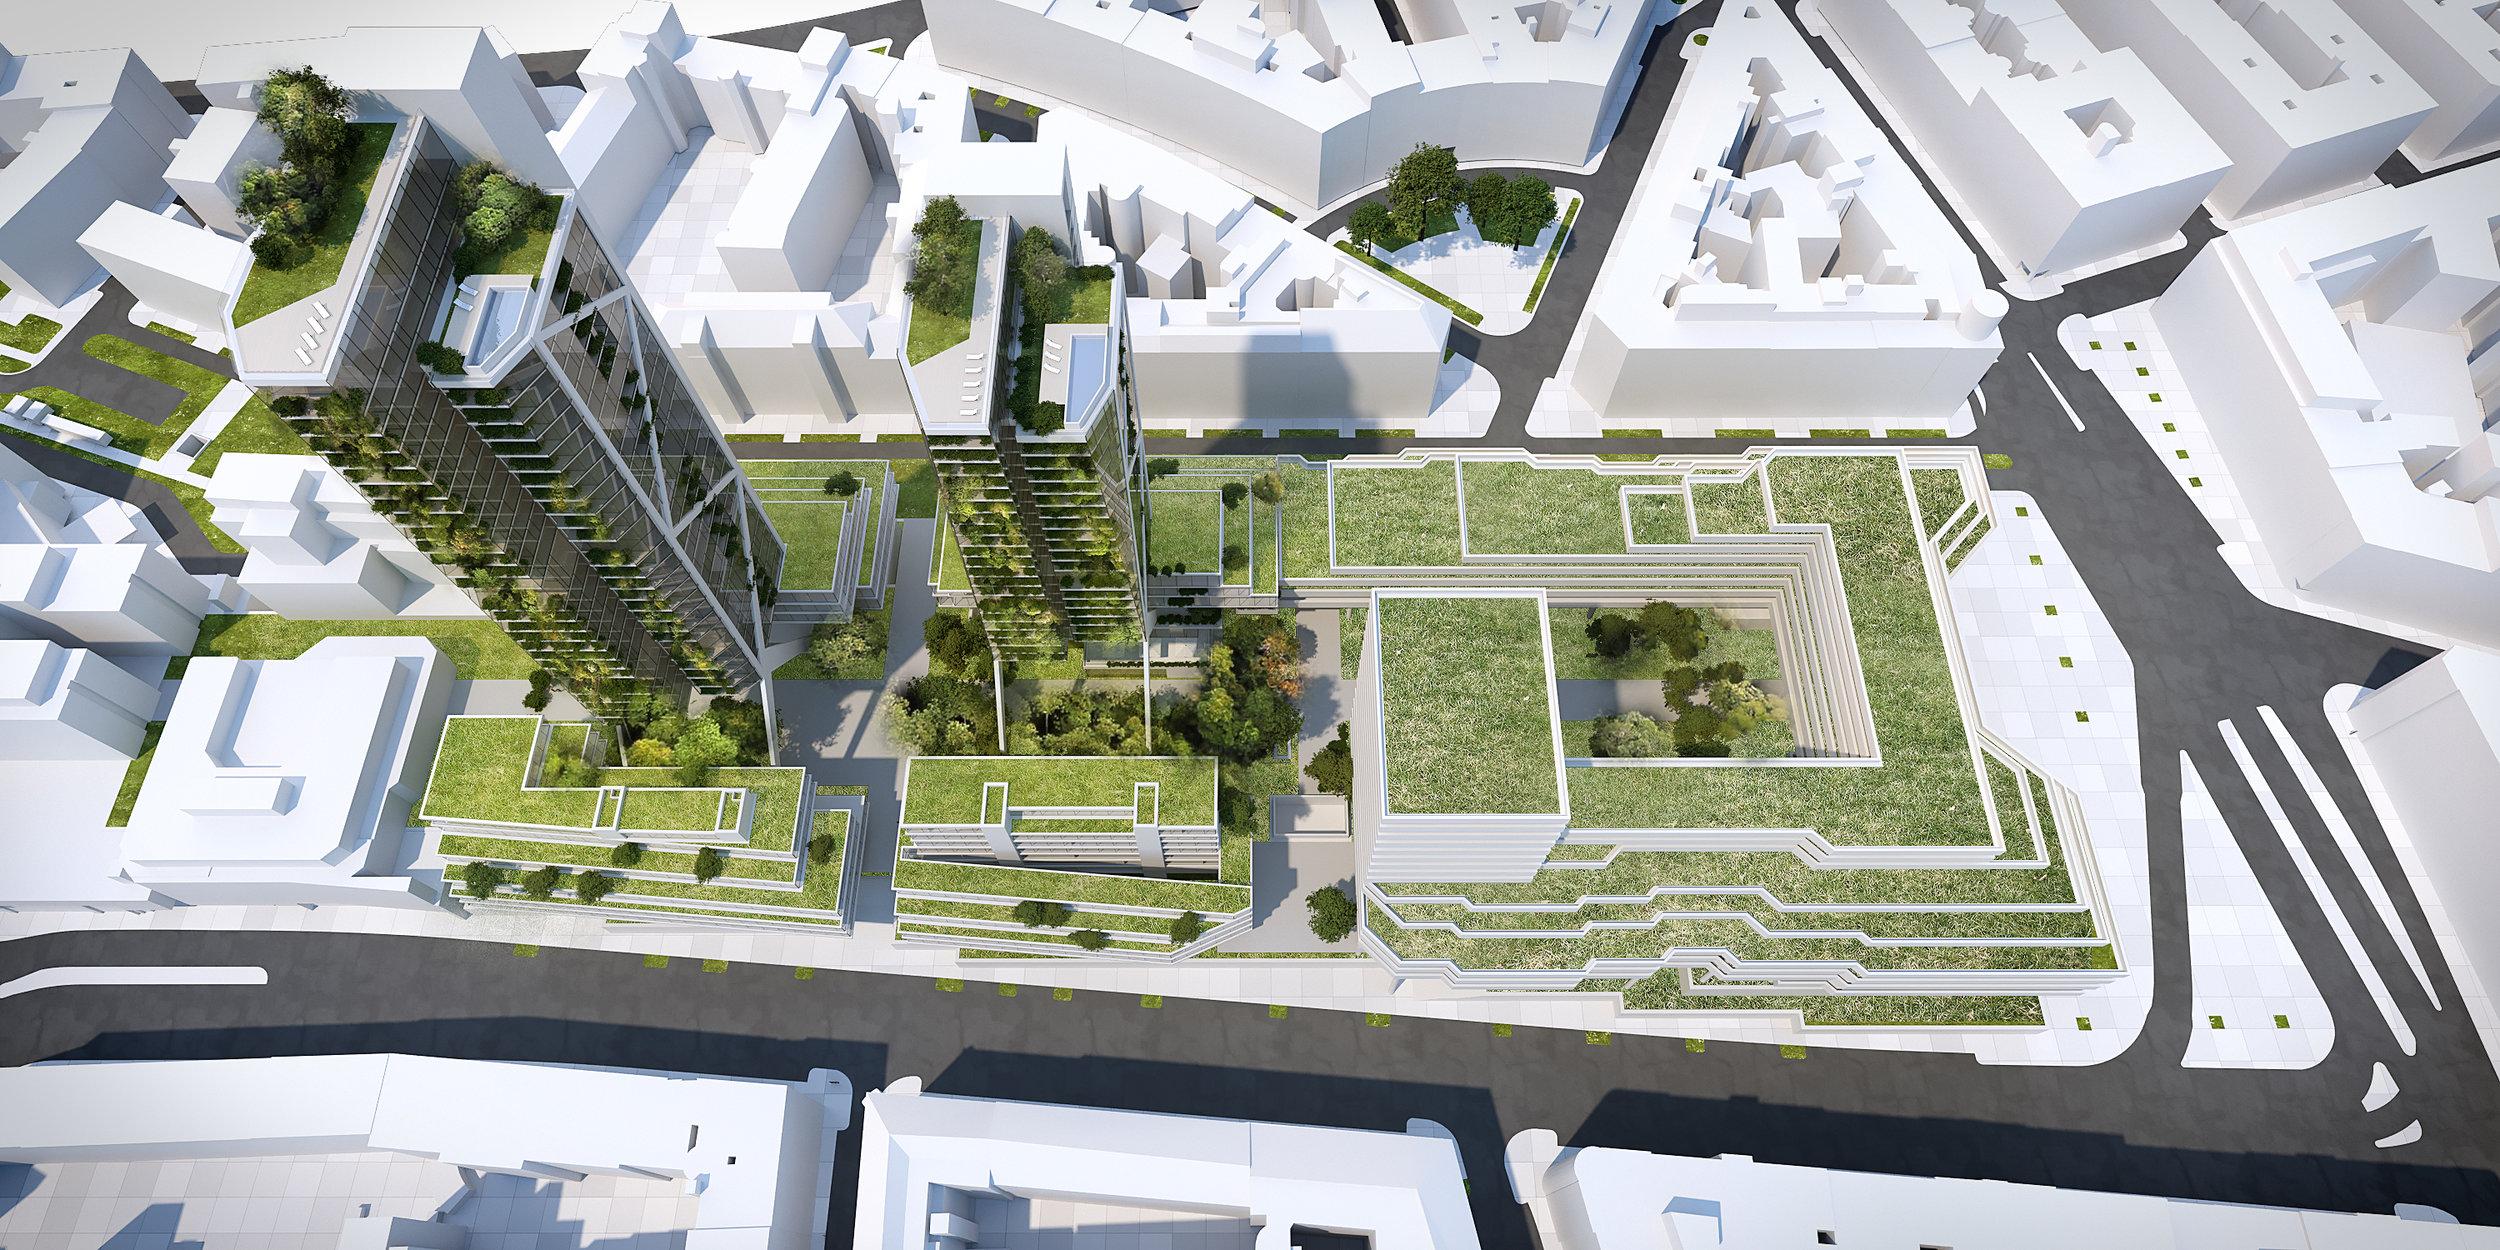 A01 architects - Althan Quartier__web02.jpg